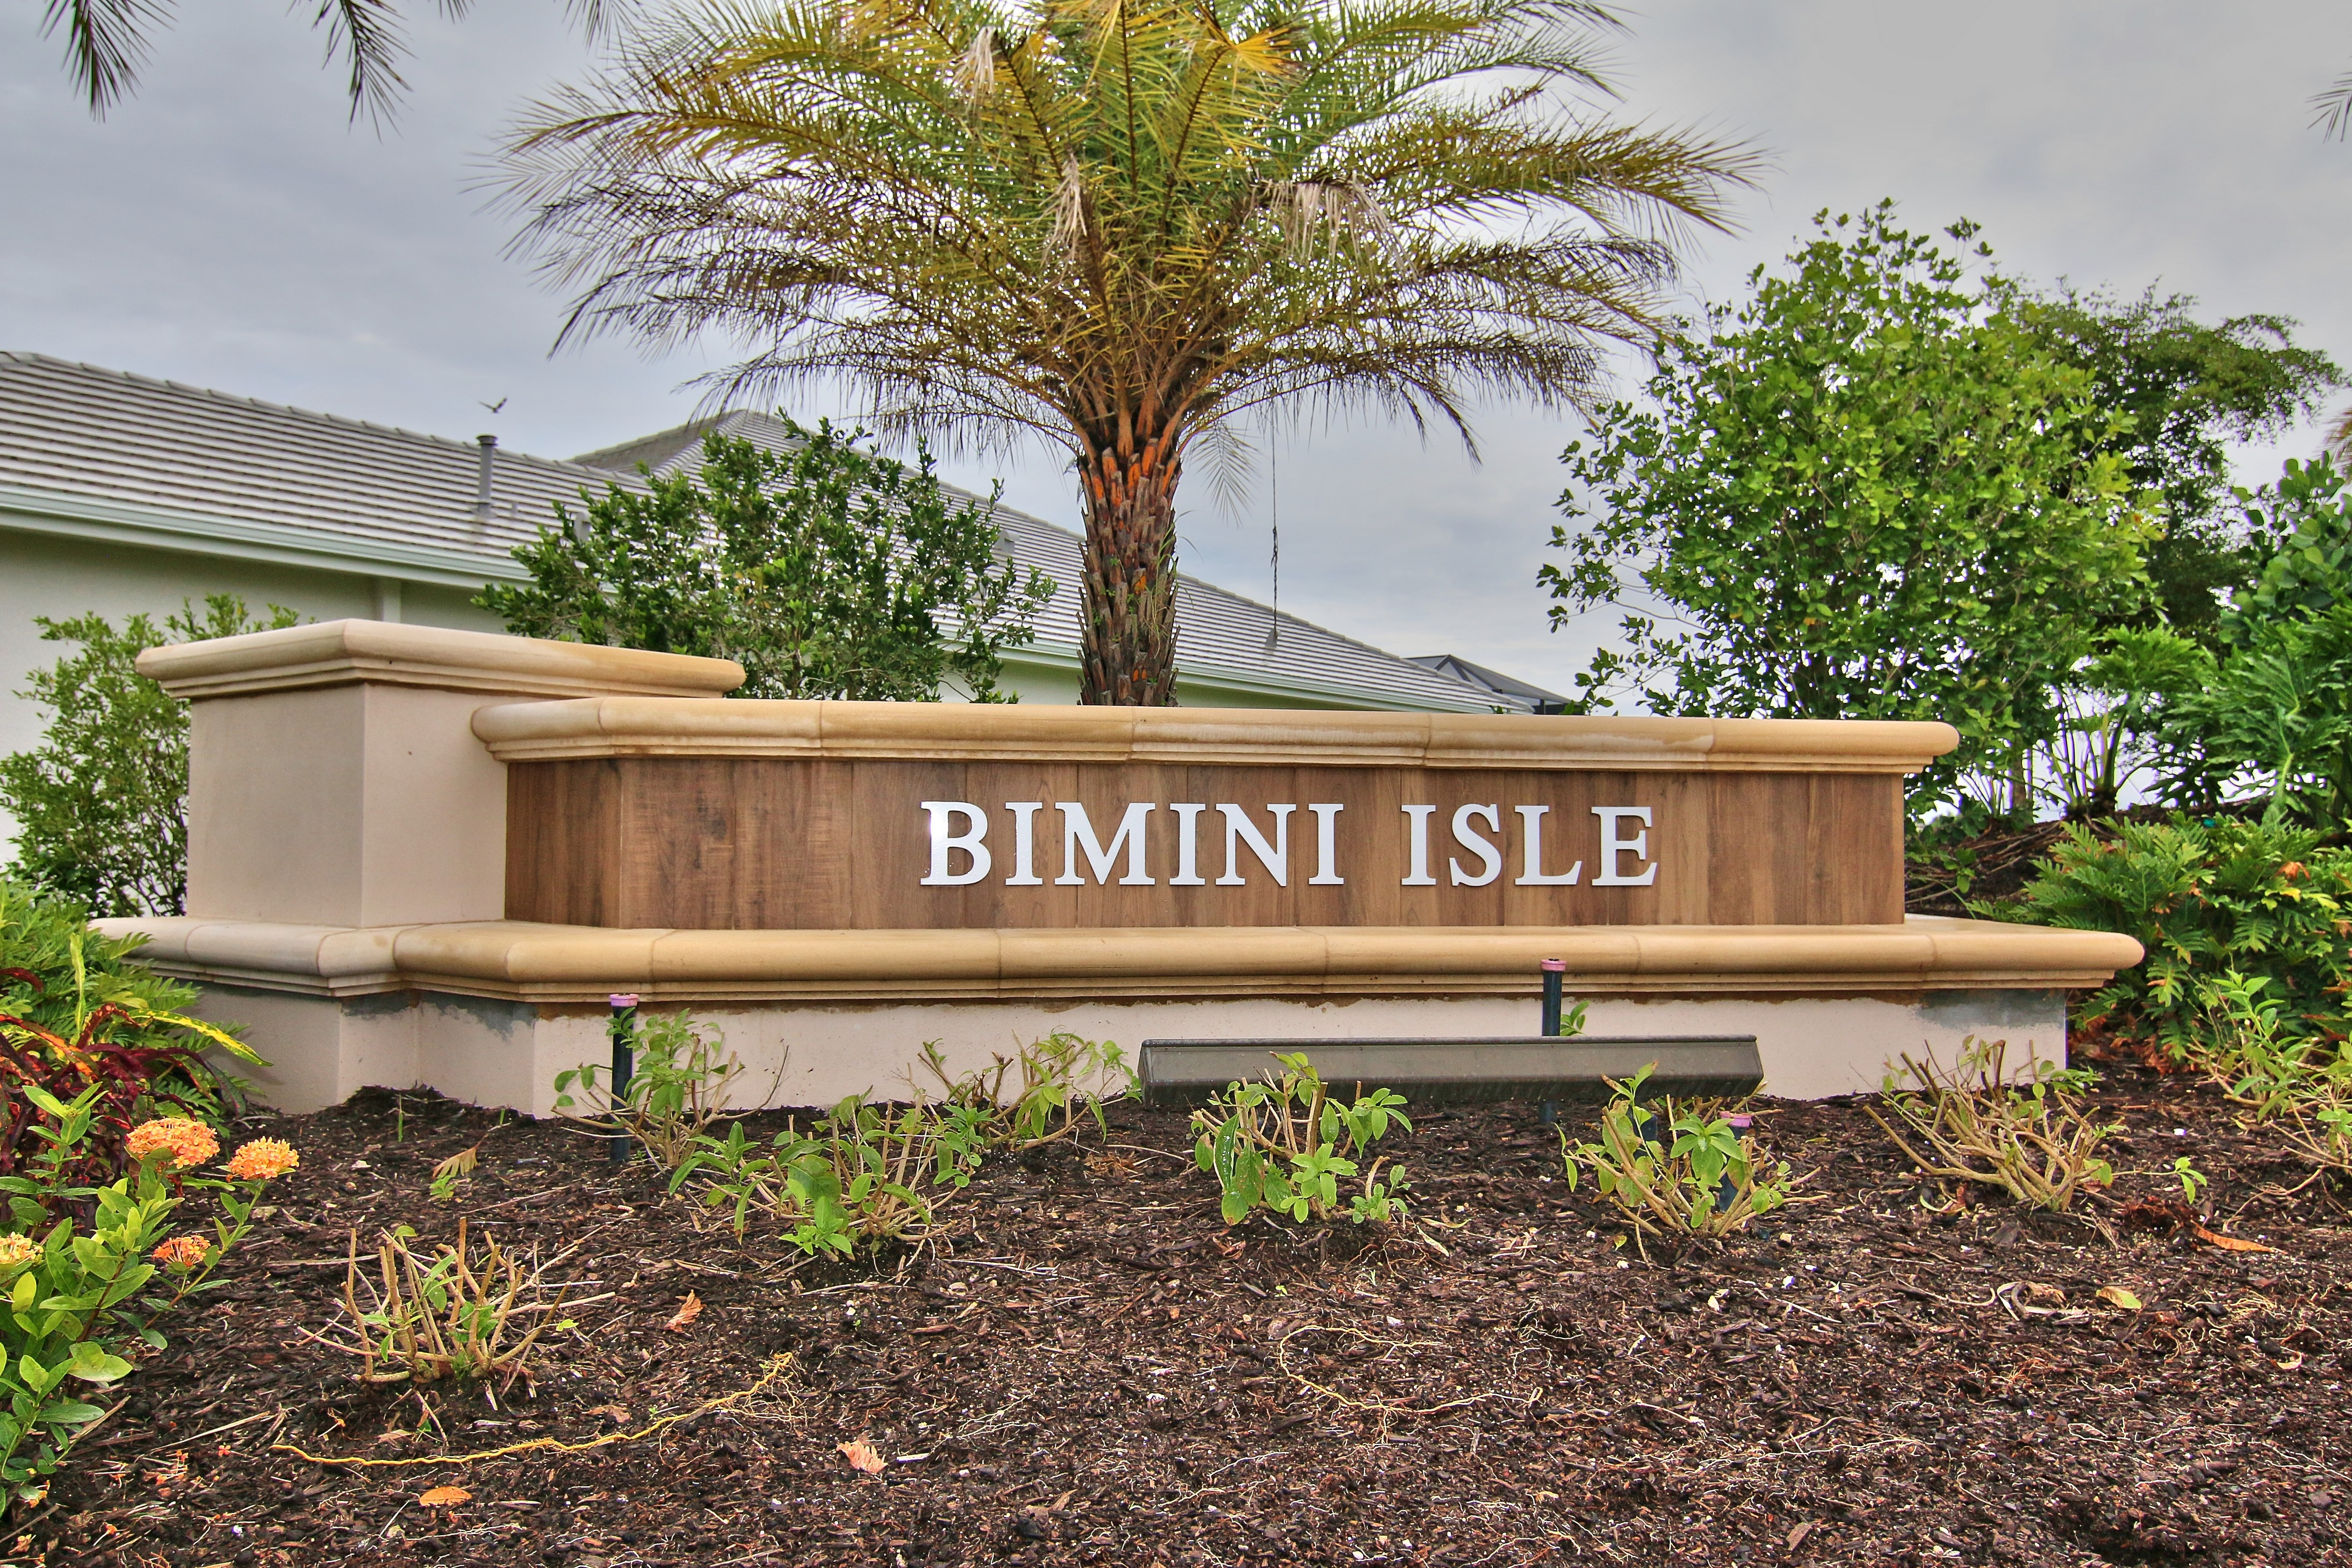 Naples Reserve Bimini Isle Home Search